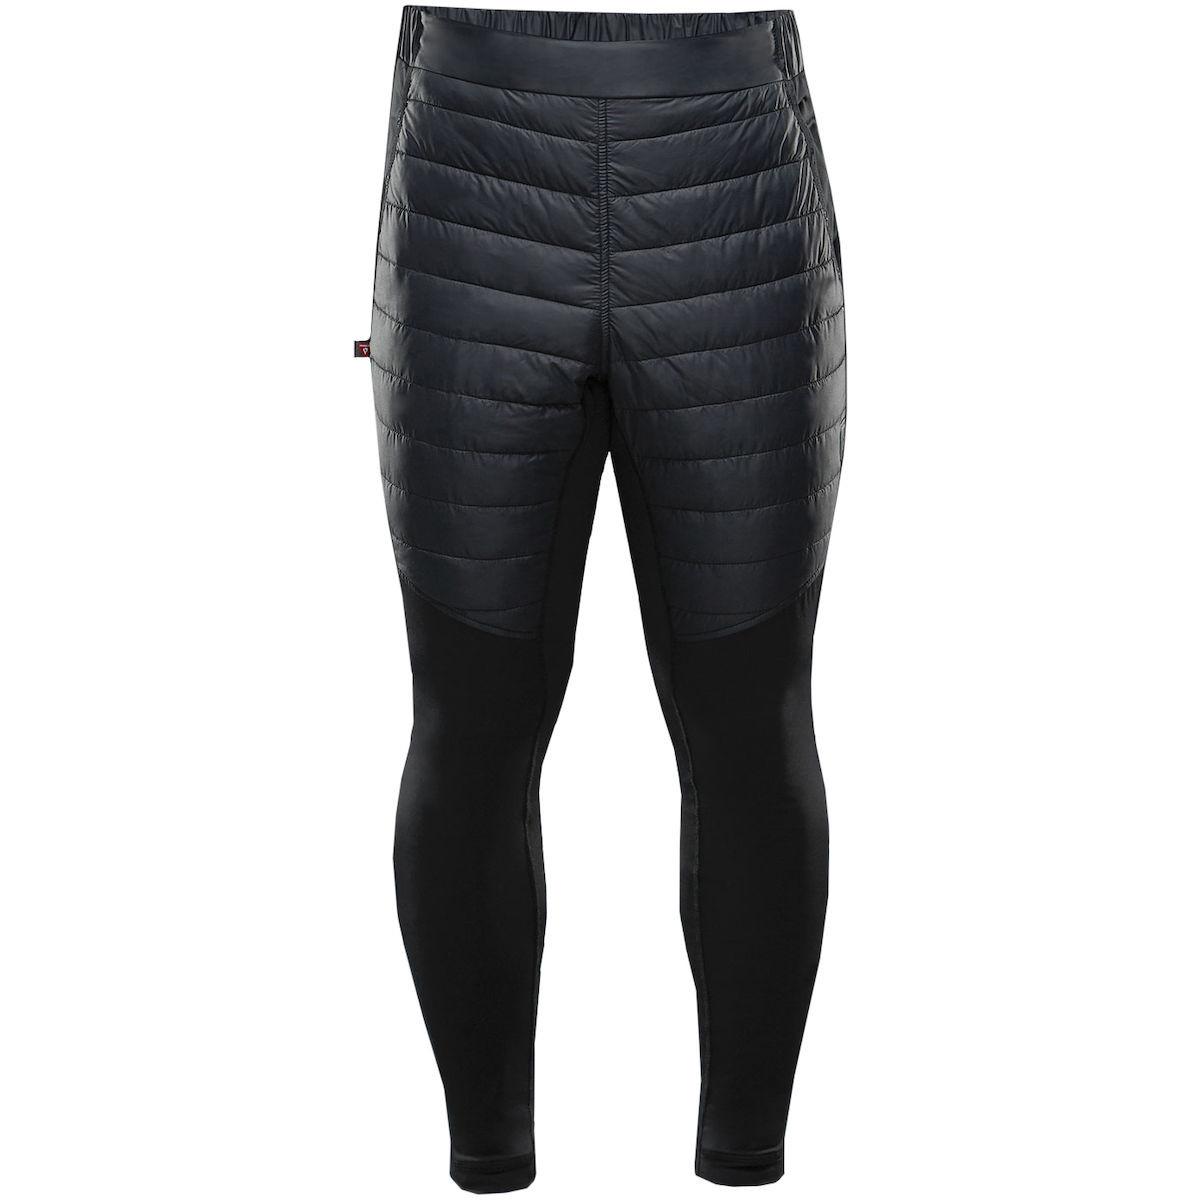 Pantalon de ski orage homme